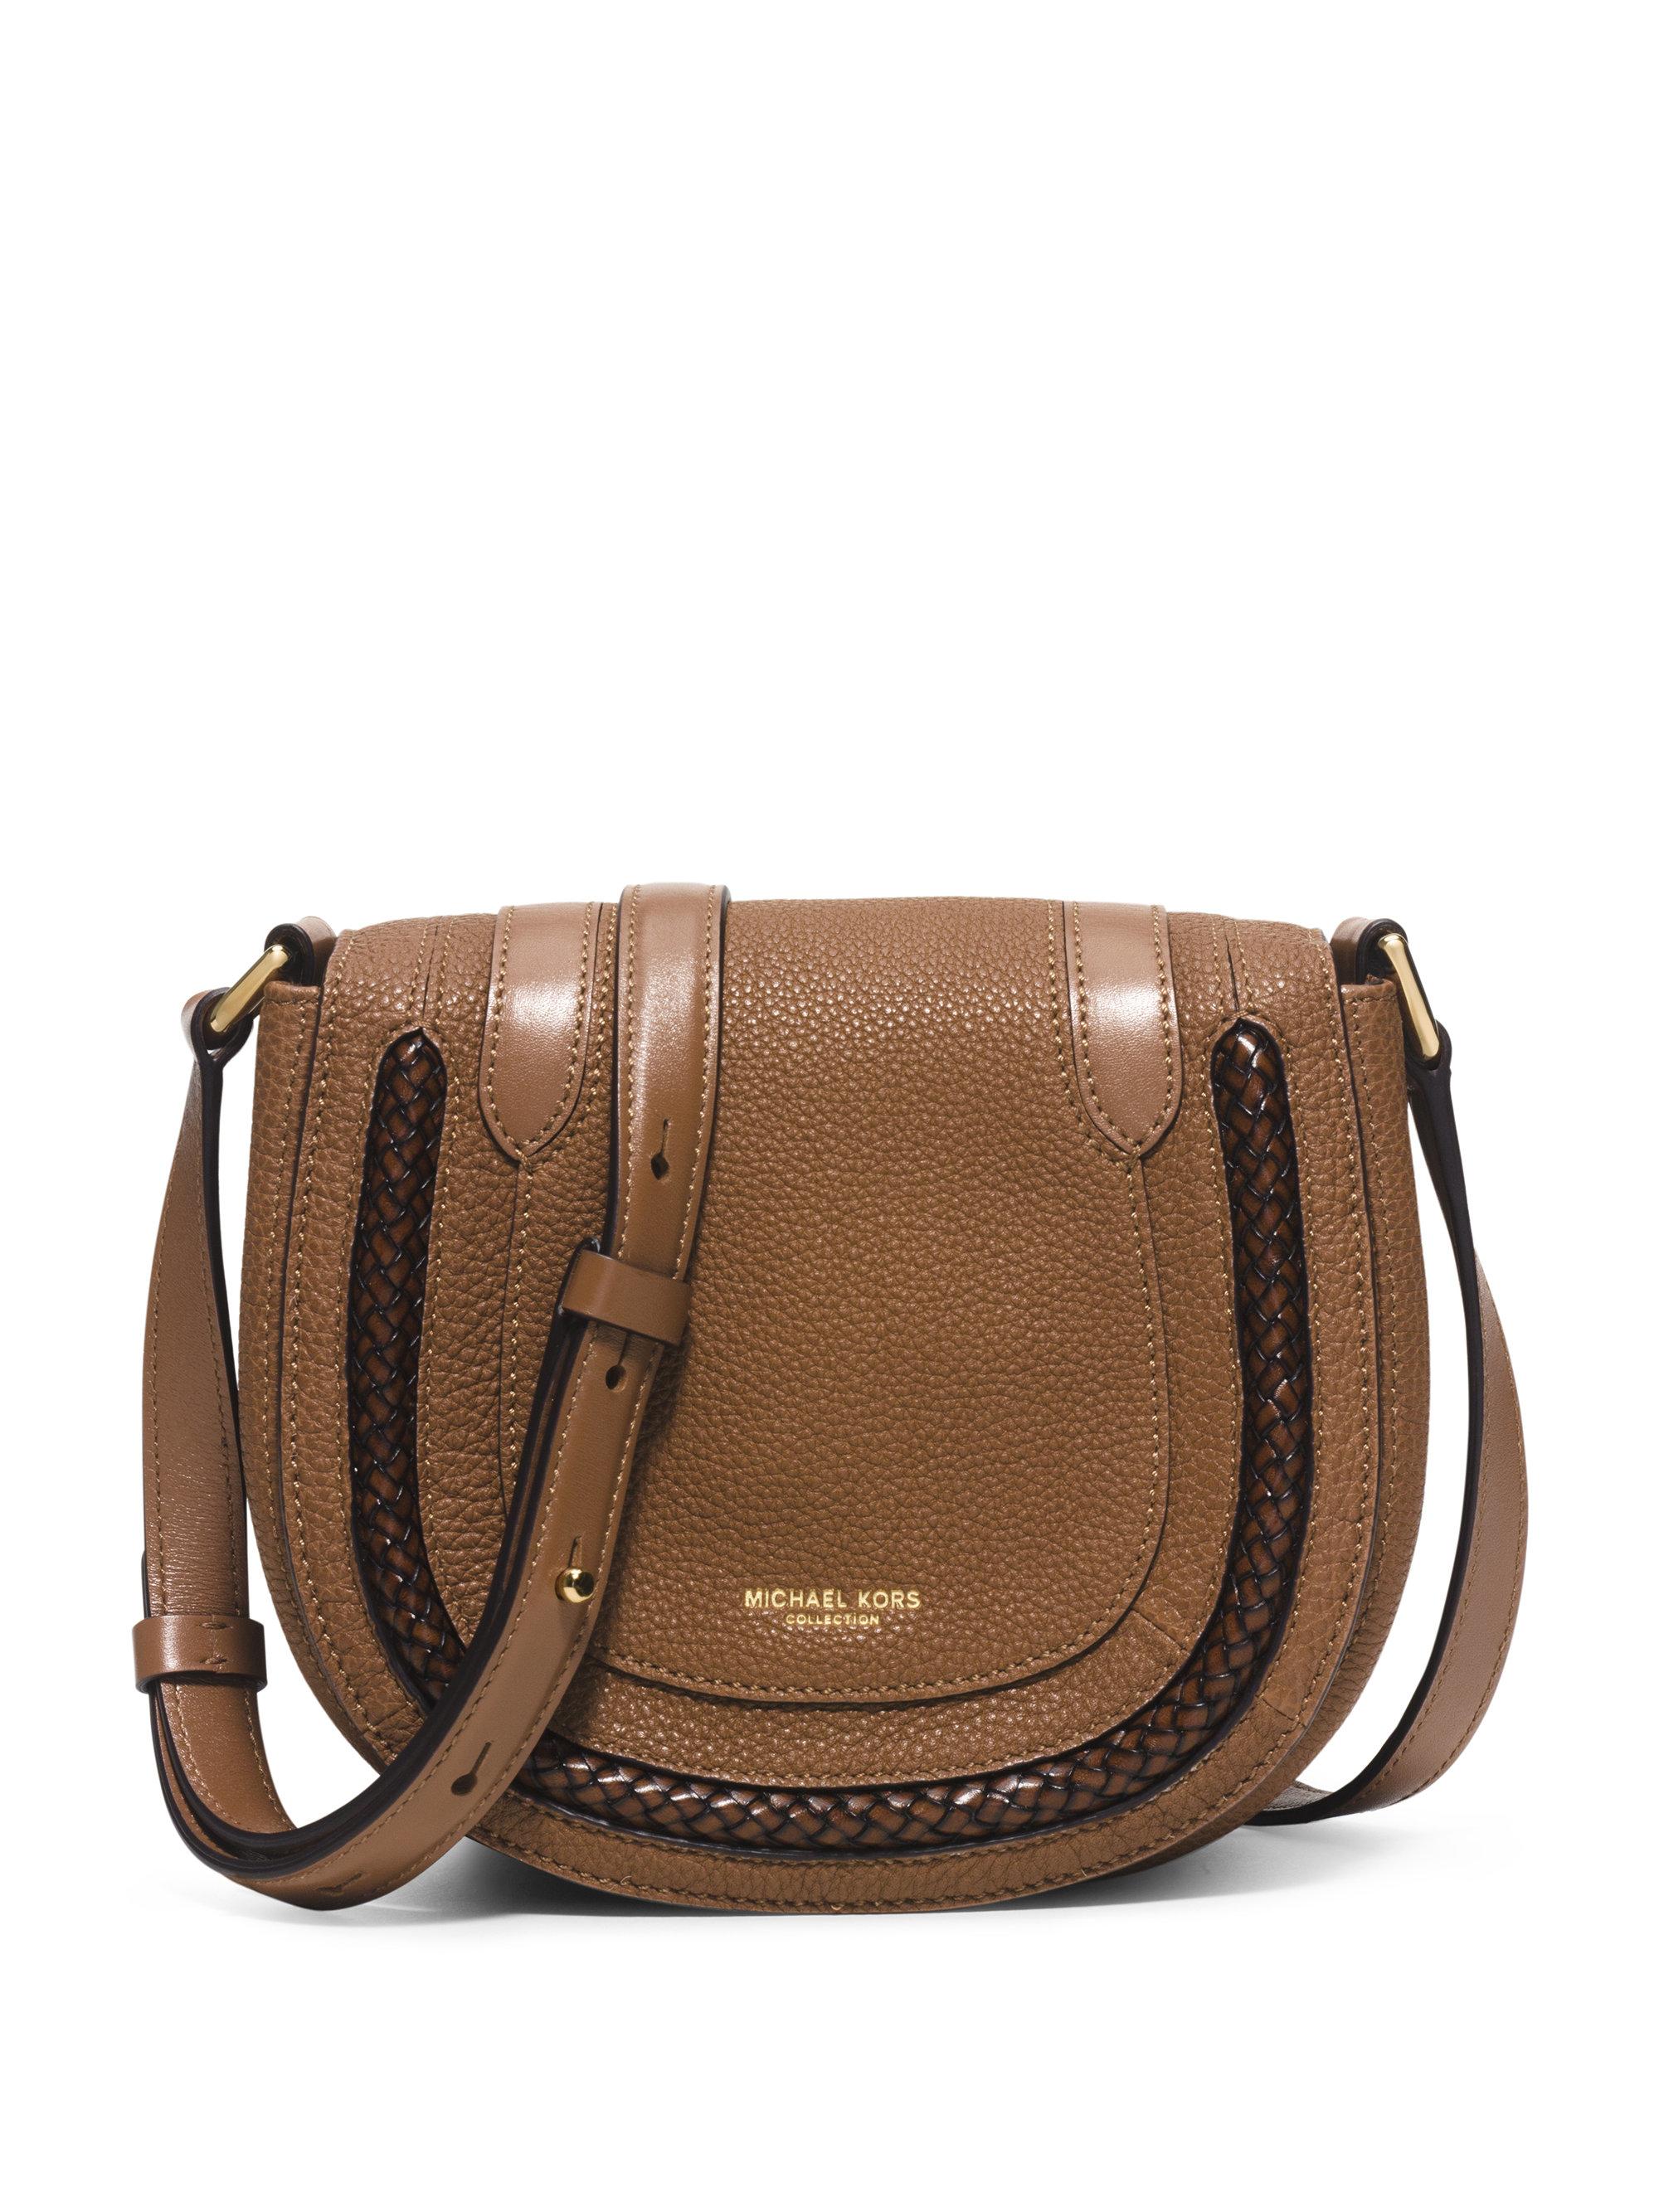 Michael Kors Skorpios Small Leather Crossbody Bag In Brown